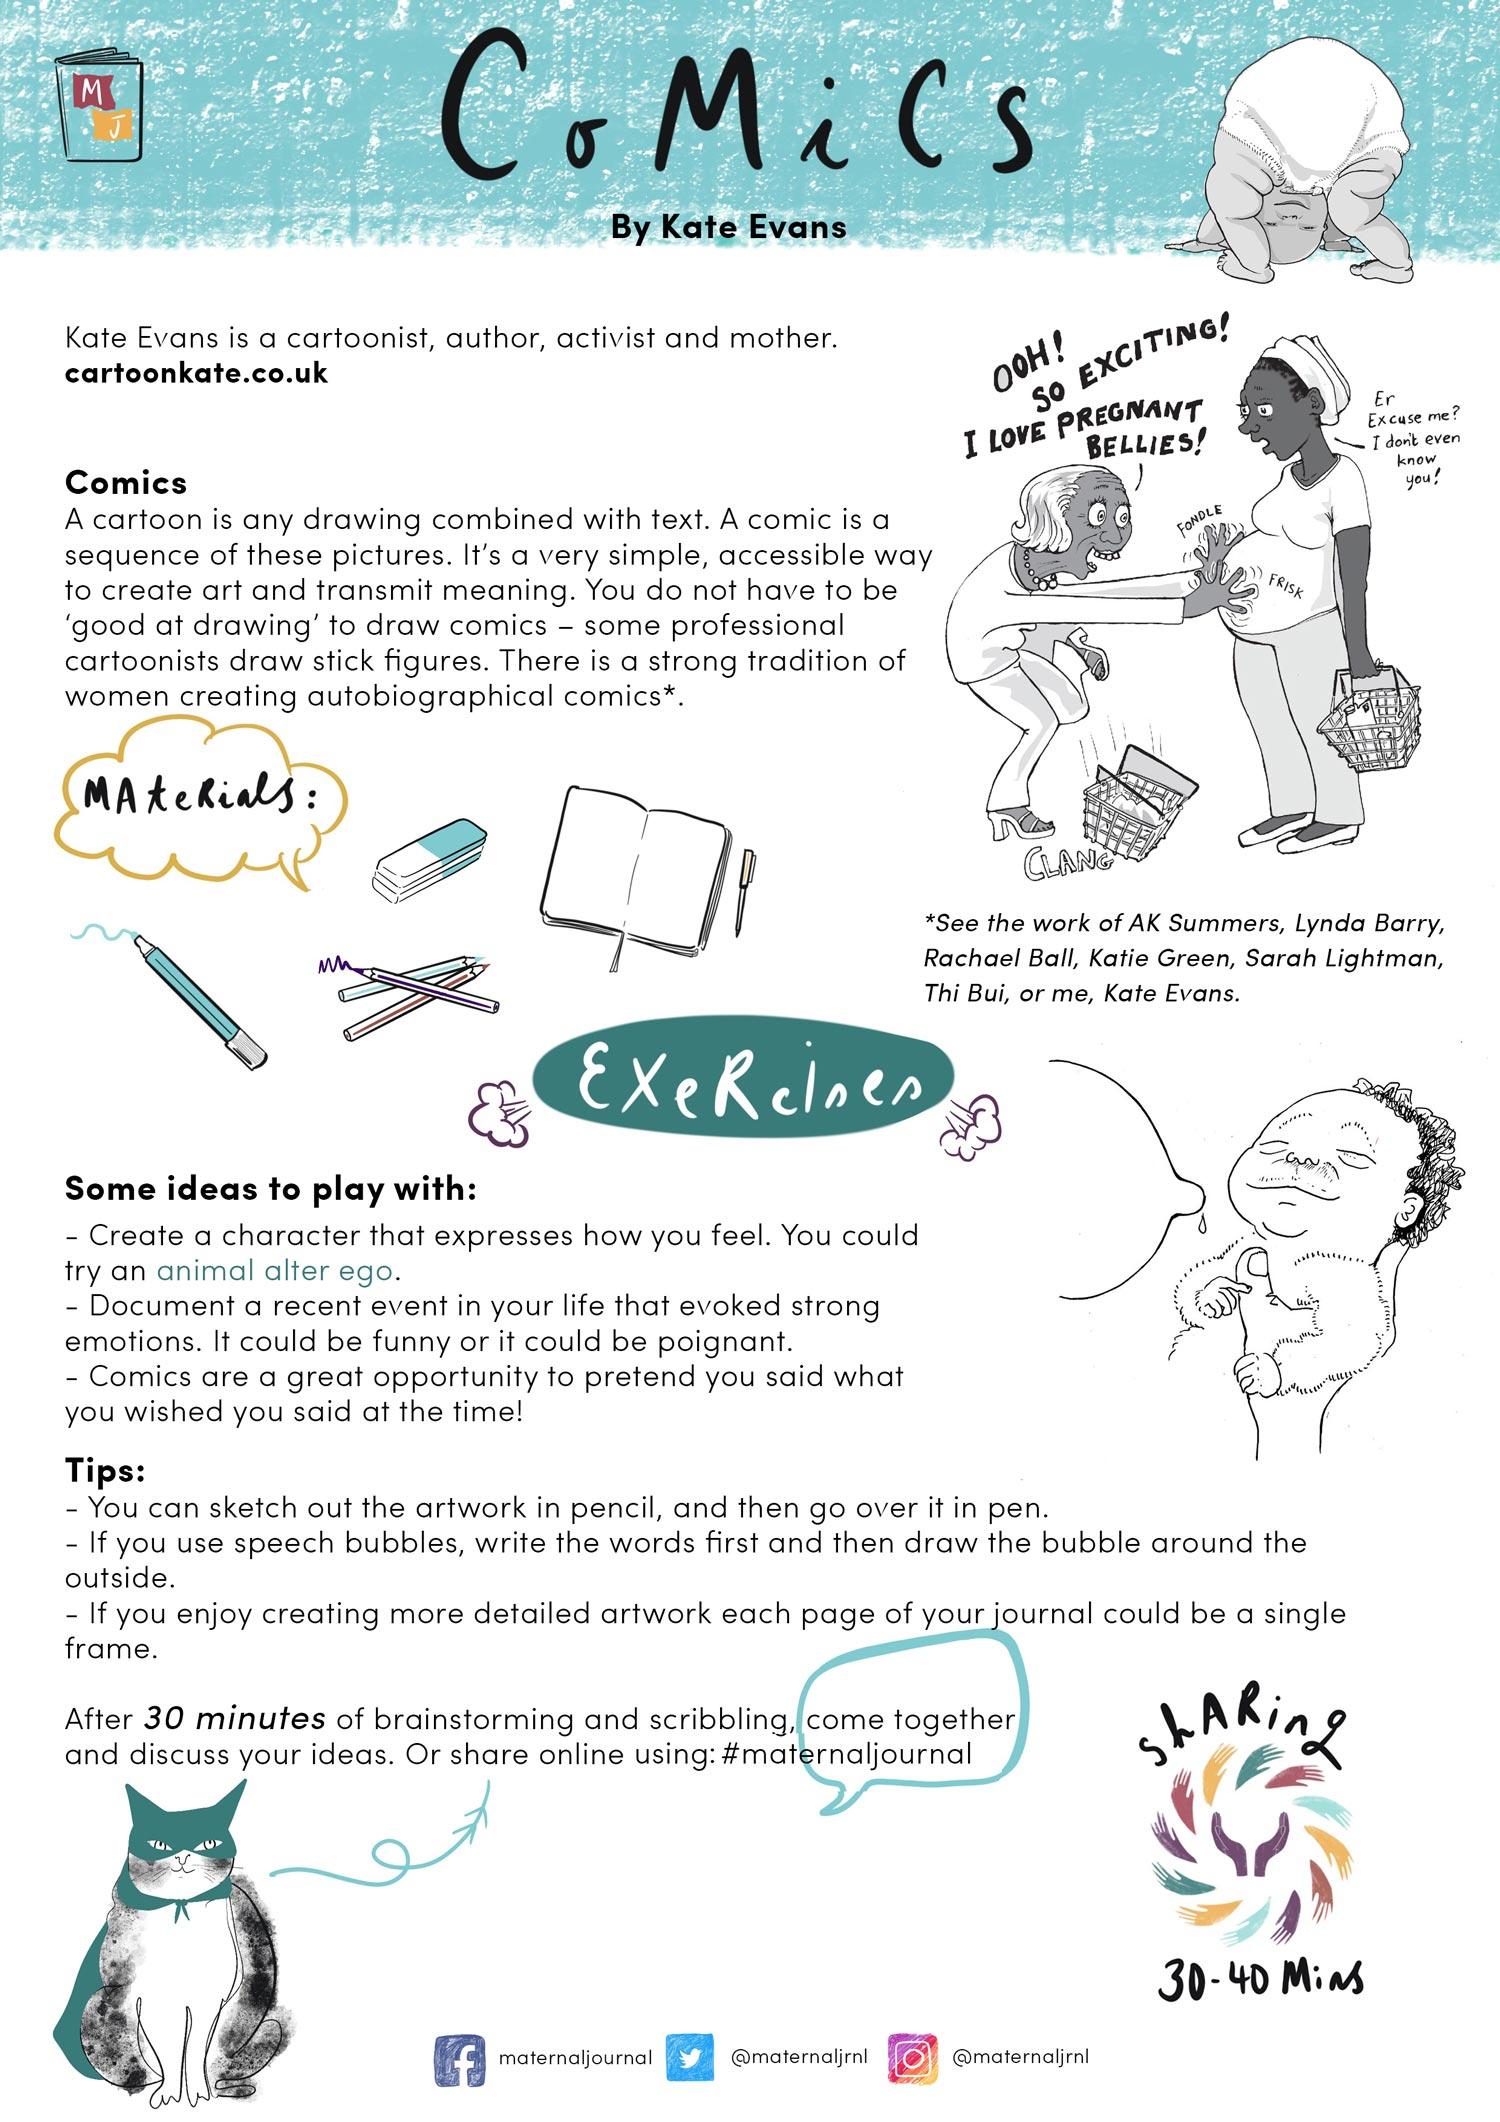 Creative journaling guide | Comics by Kate Evans | Illustration by Merlin Strangeway | Maternal Journal | 2019